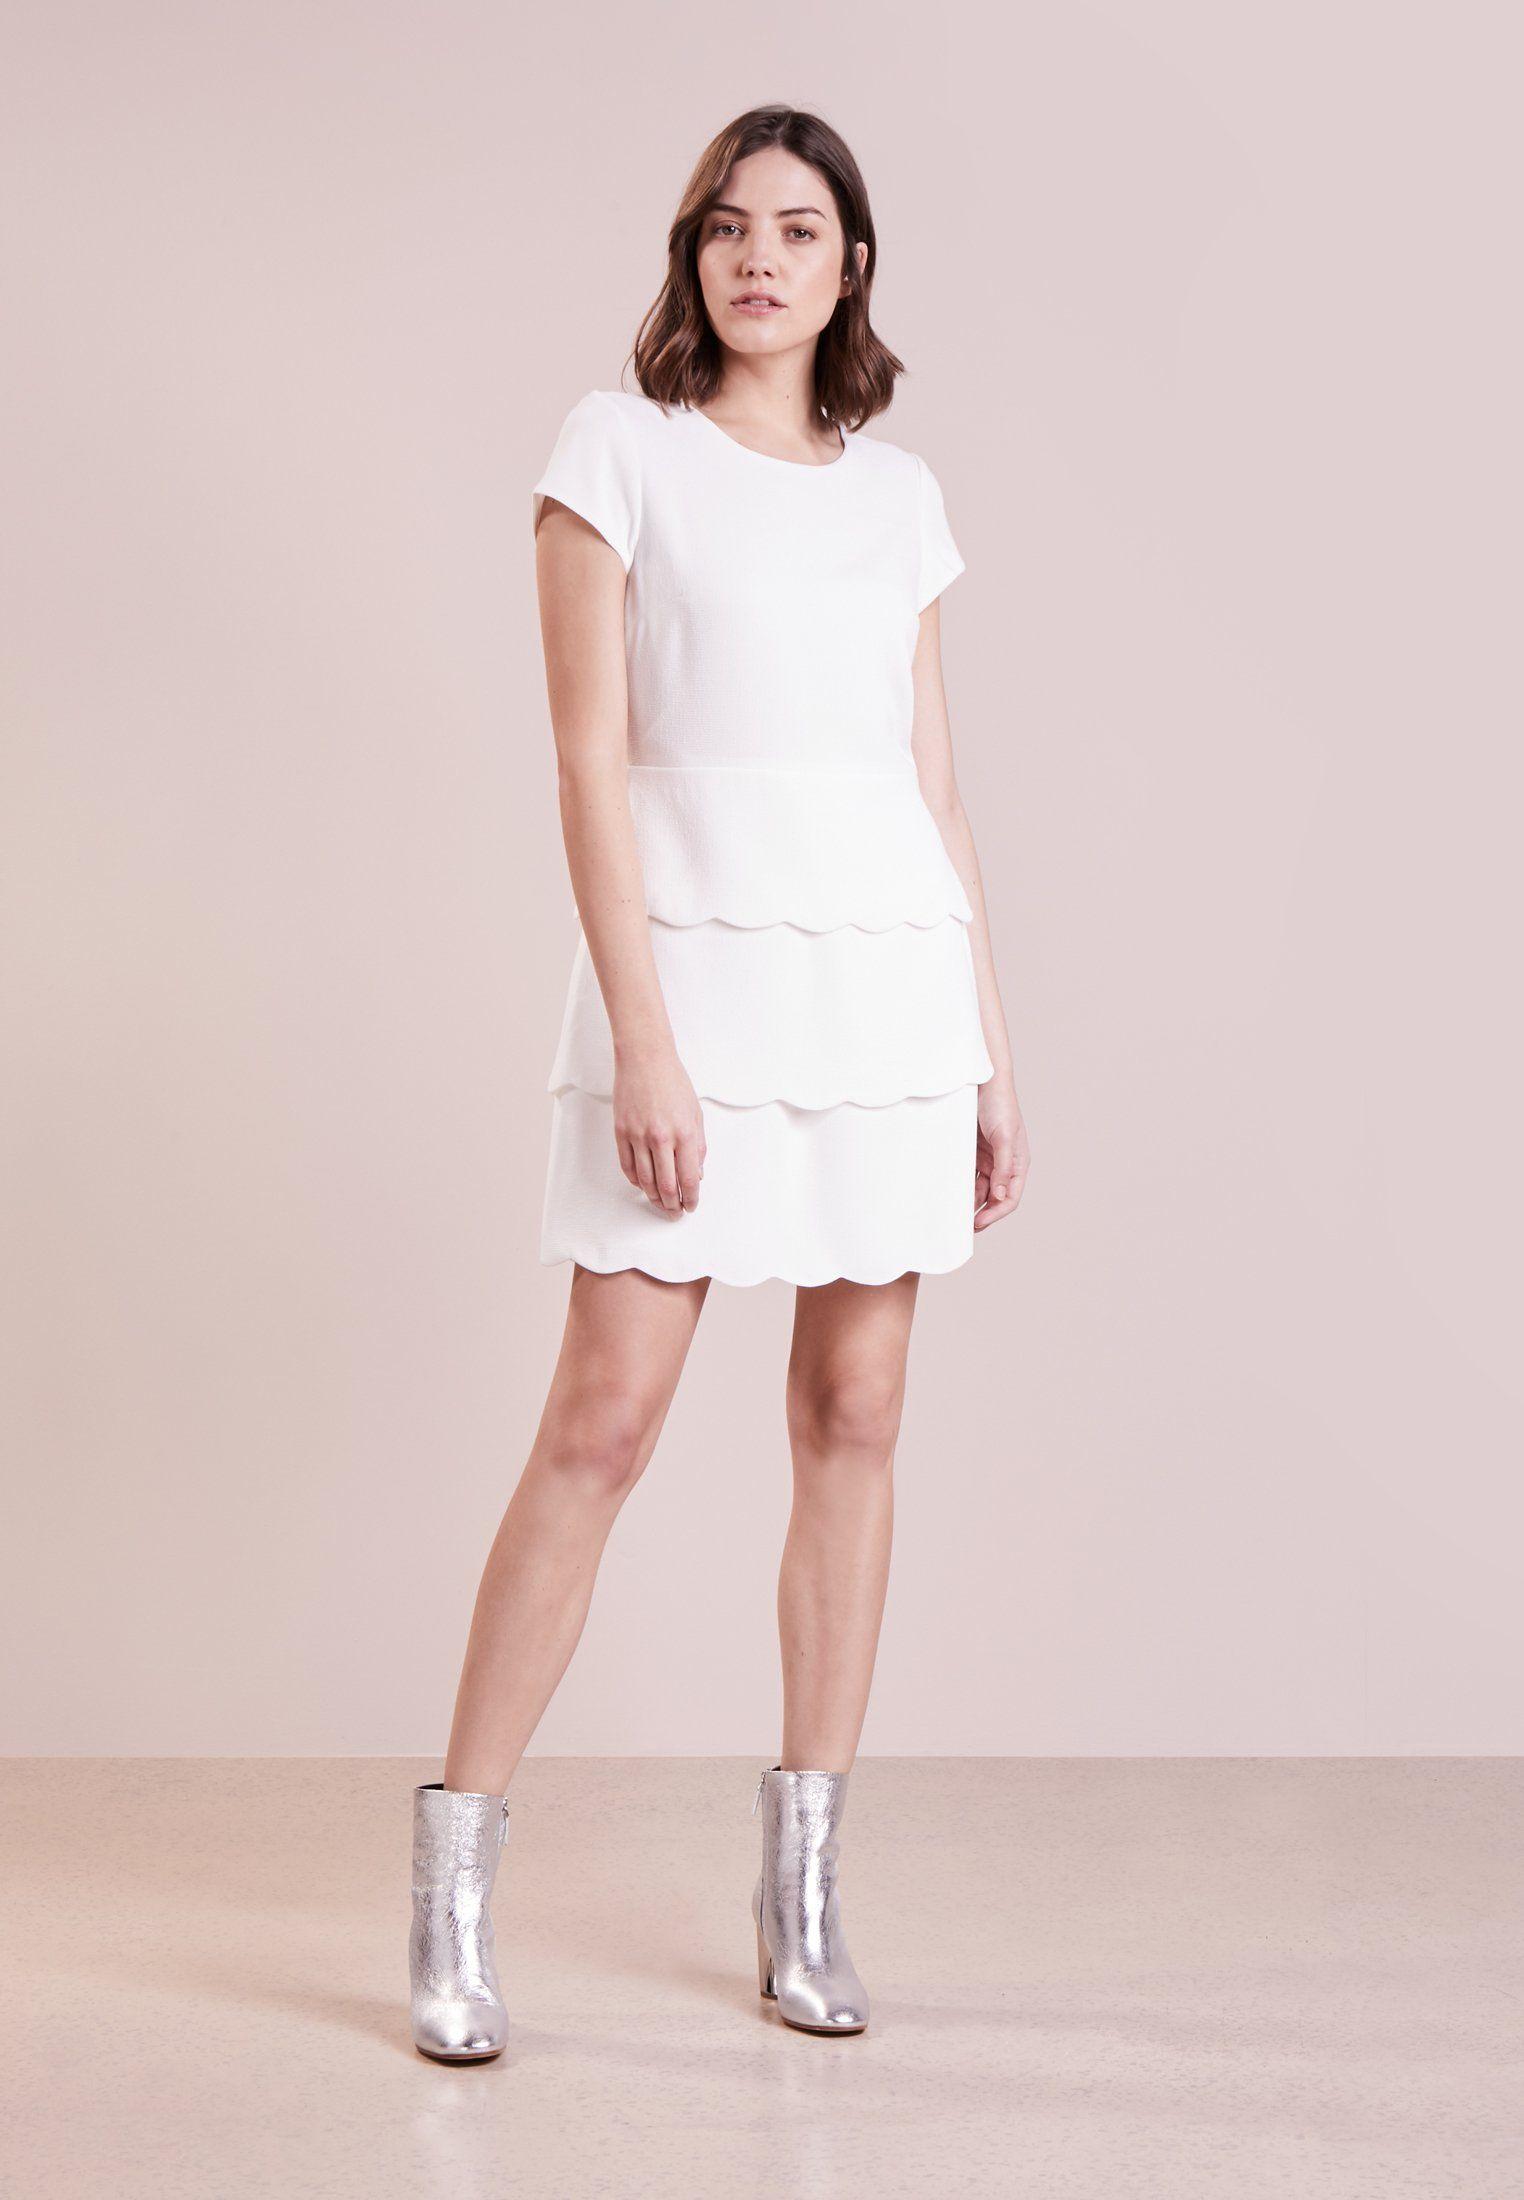 Club Monaco Colby Robe De Soiree White Zalando Fr Robe Blanche Idees Vestimentaires Robe D Ete